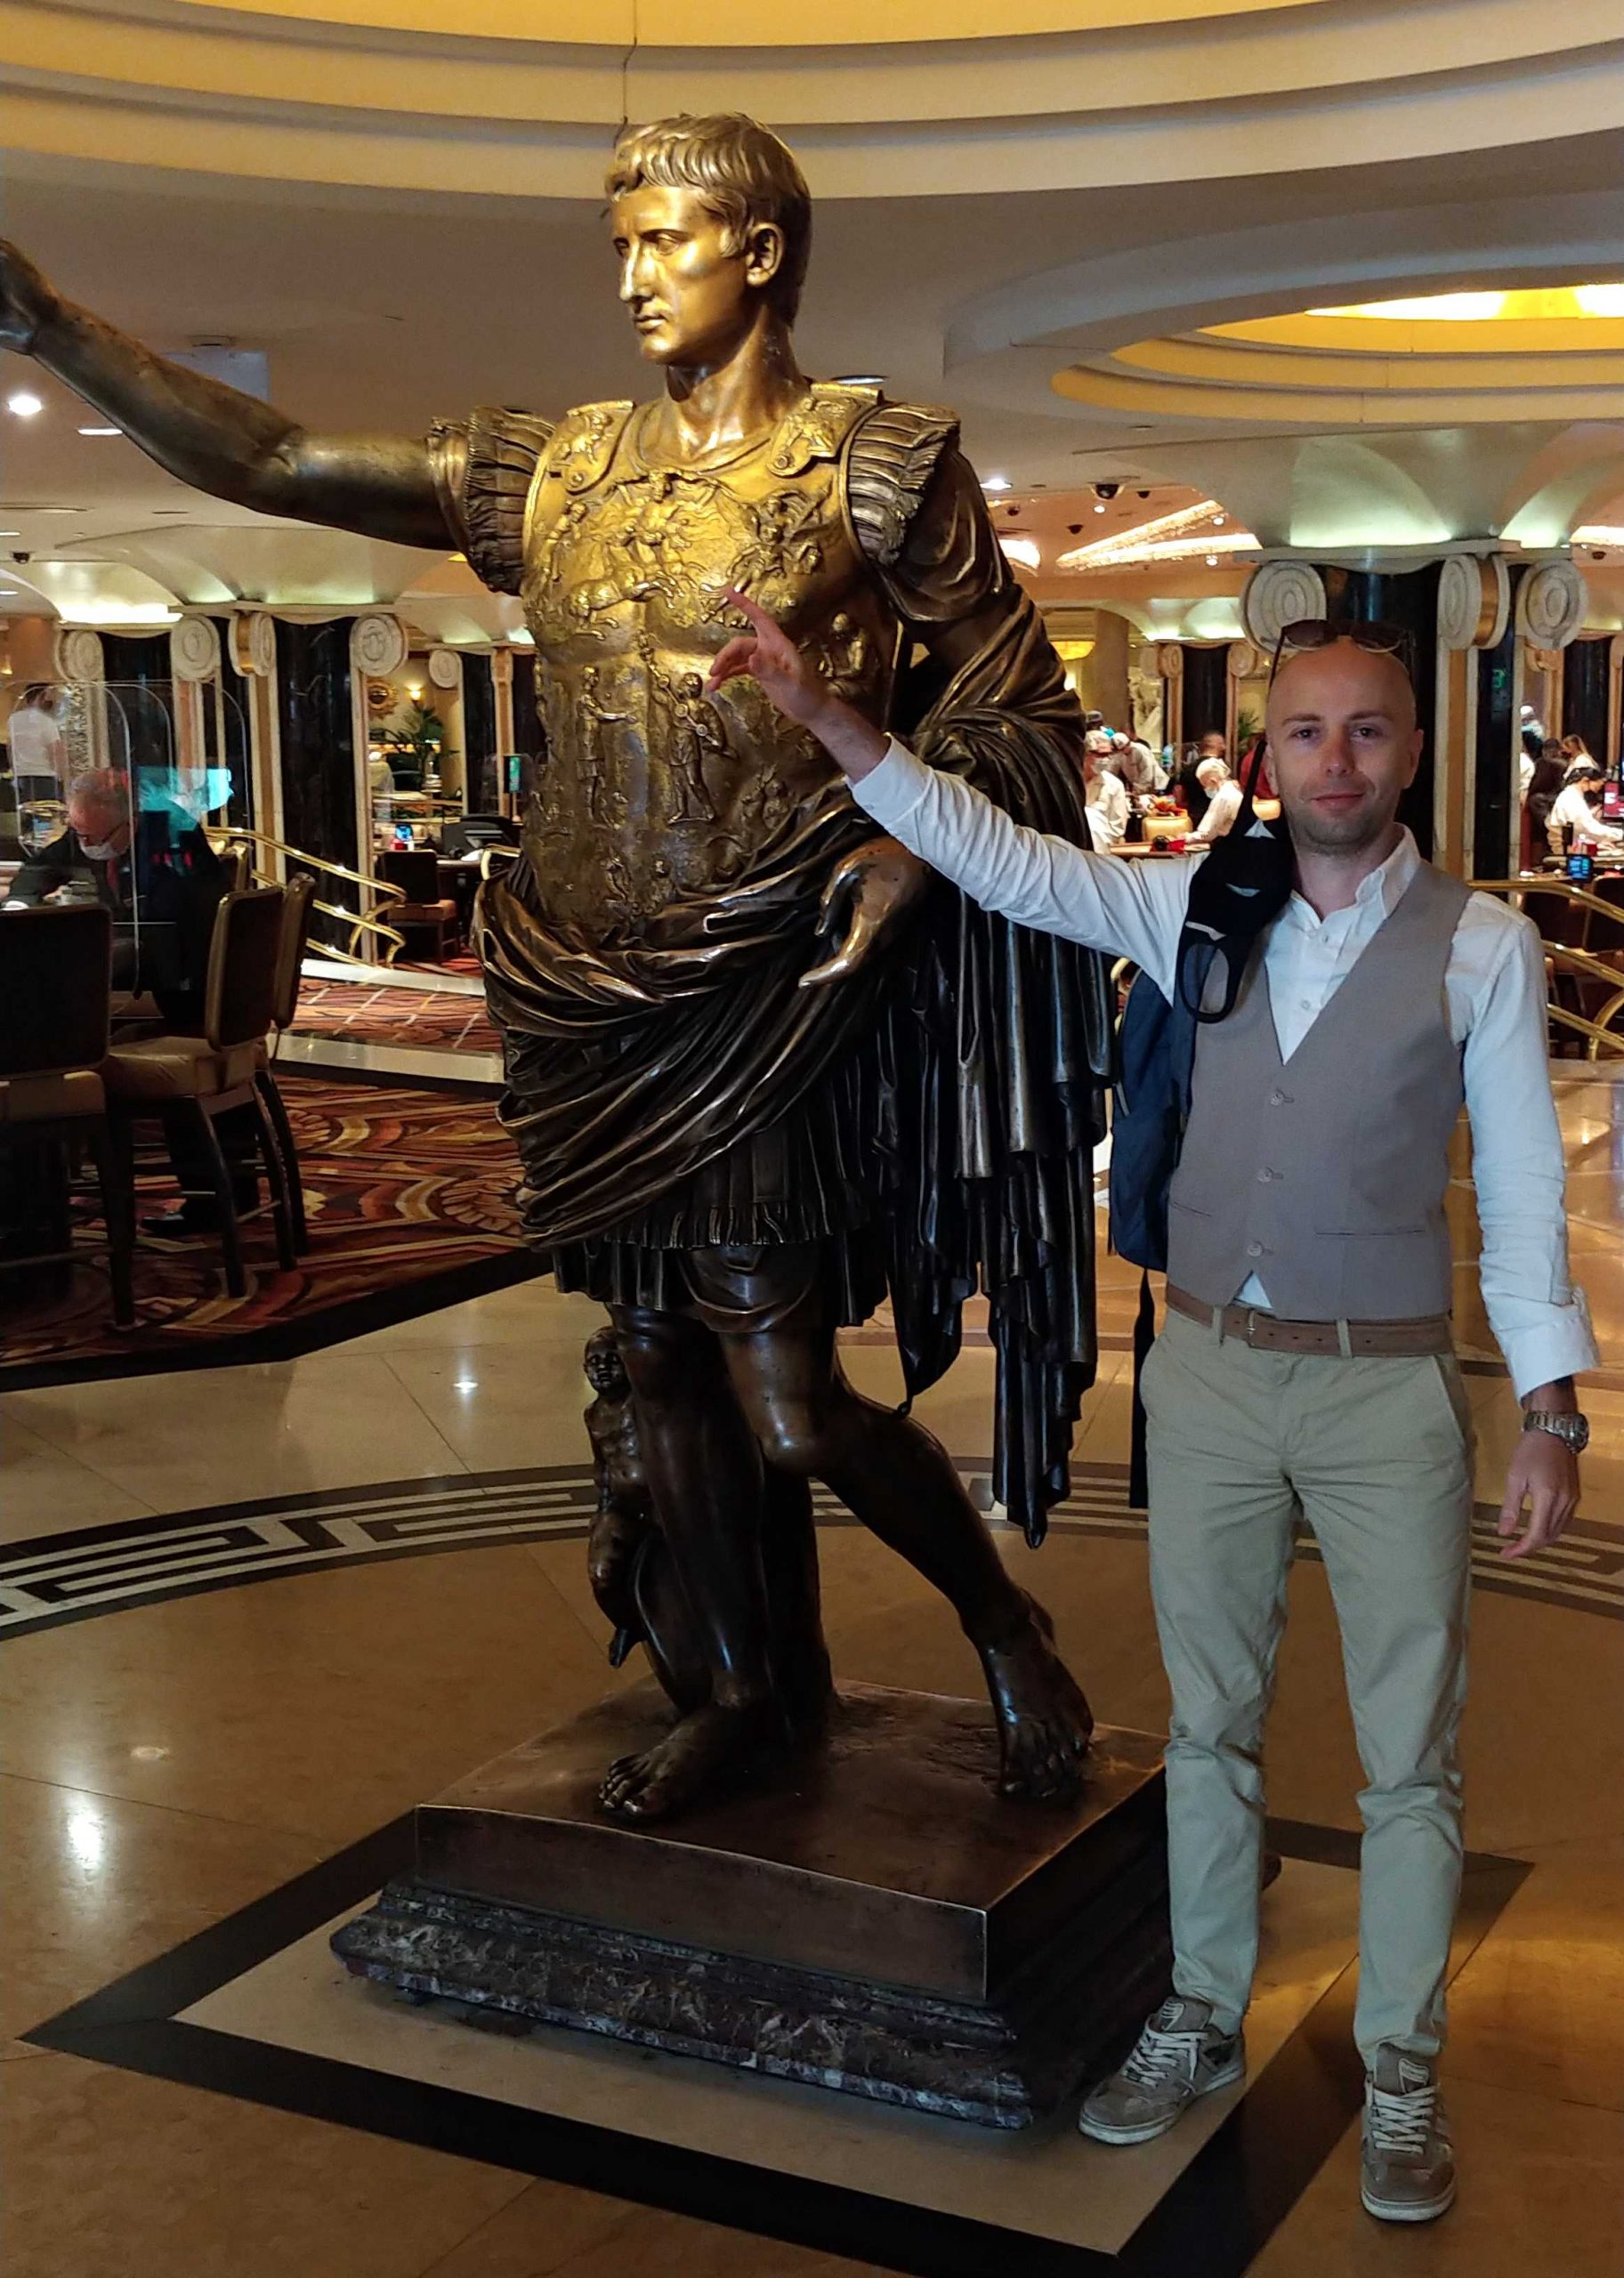 lucio buffalmano next to Caesar statue